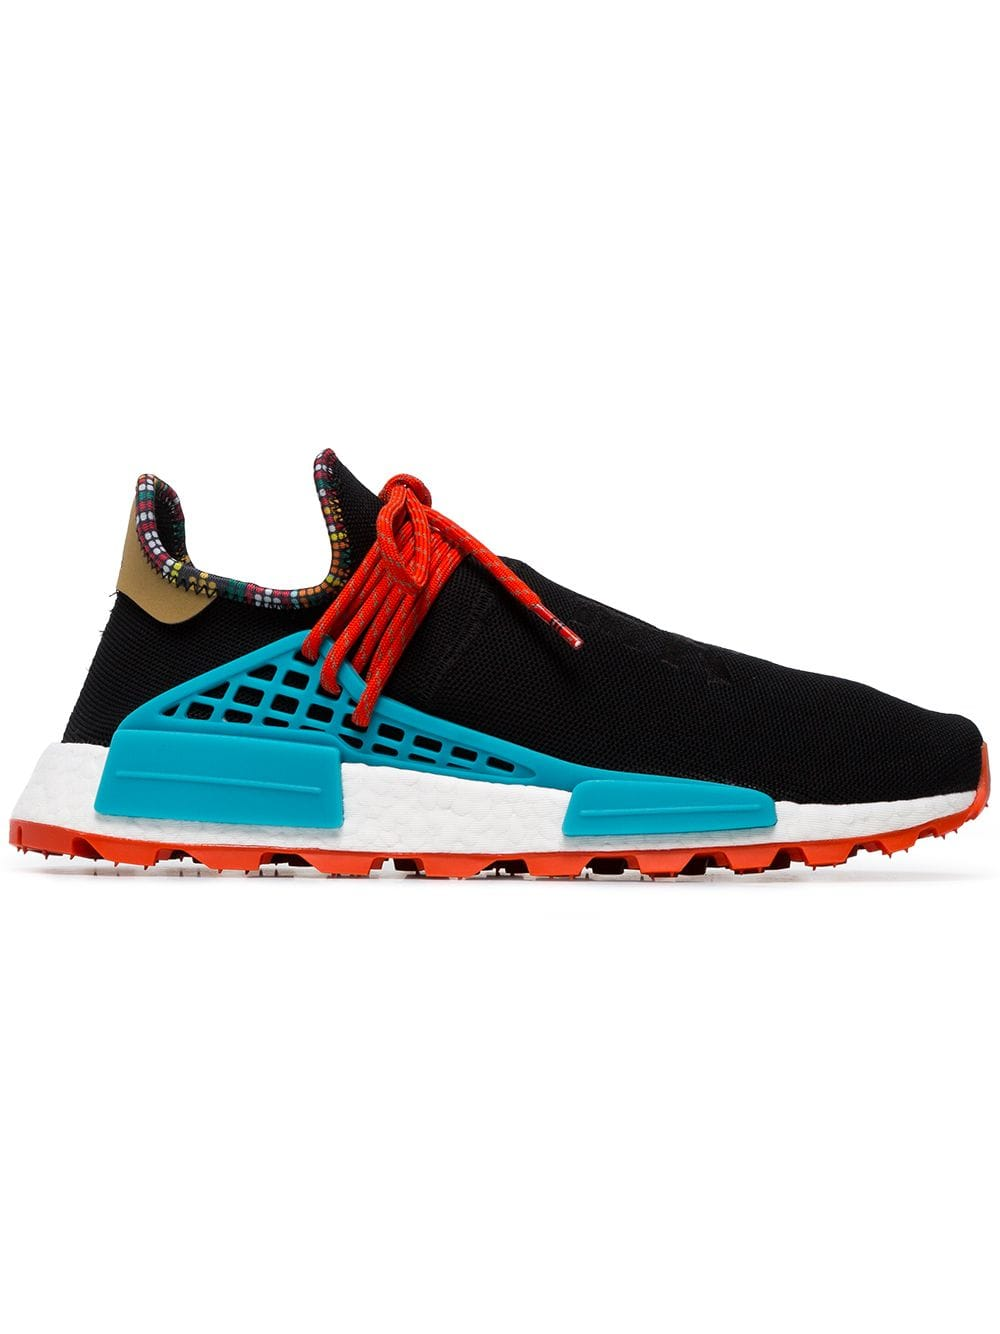 Adidas By Pharrell Williams Adidas x Pharrell Williams Black